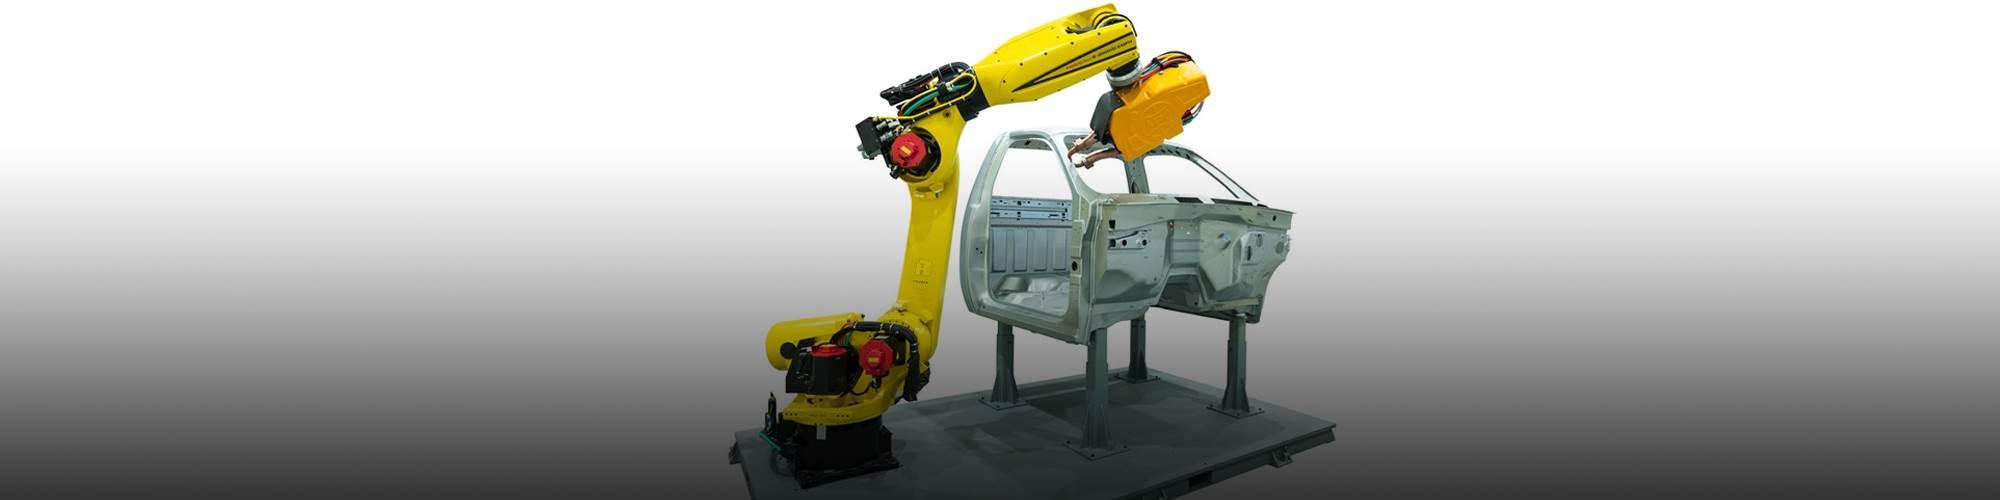 The FANUC America six-axis R-2000iD/210FH robot. (Image: FANUC America)